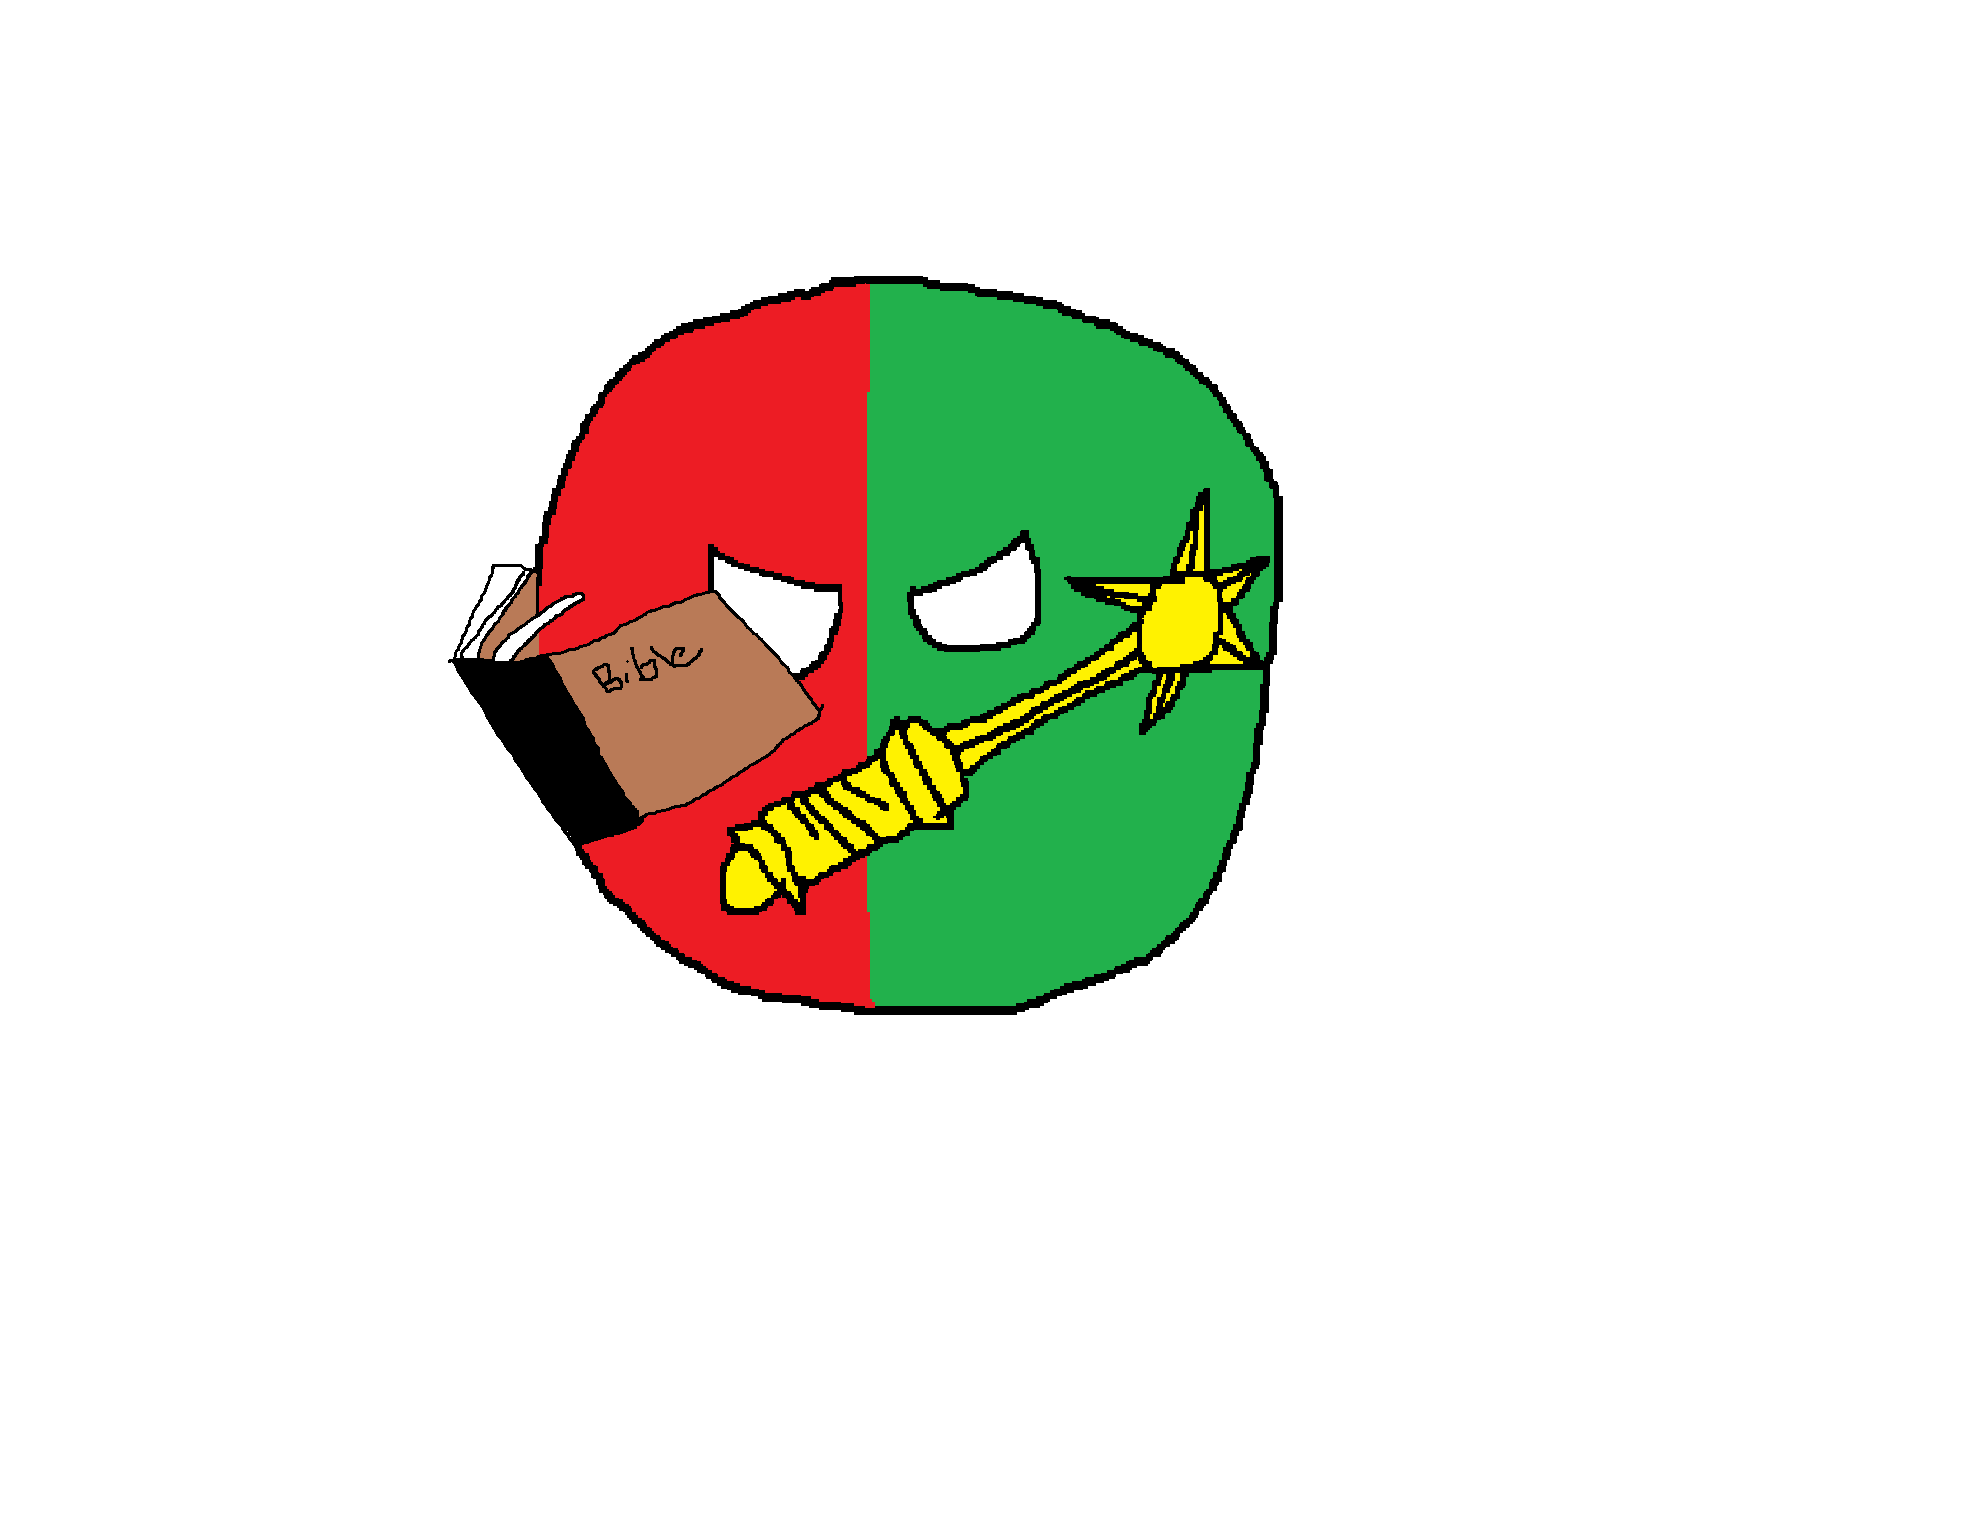 Colmarball